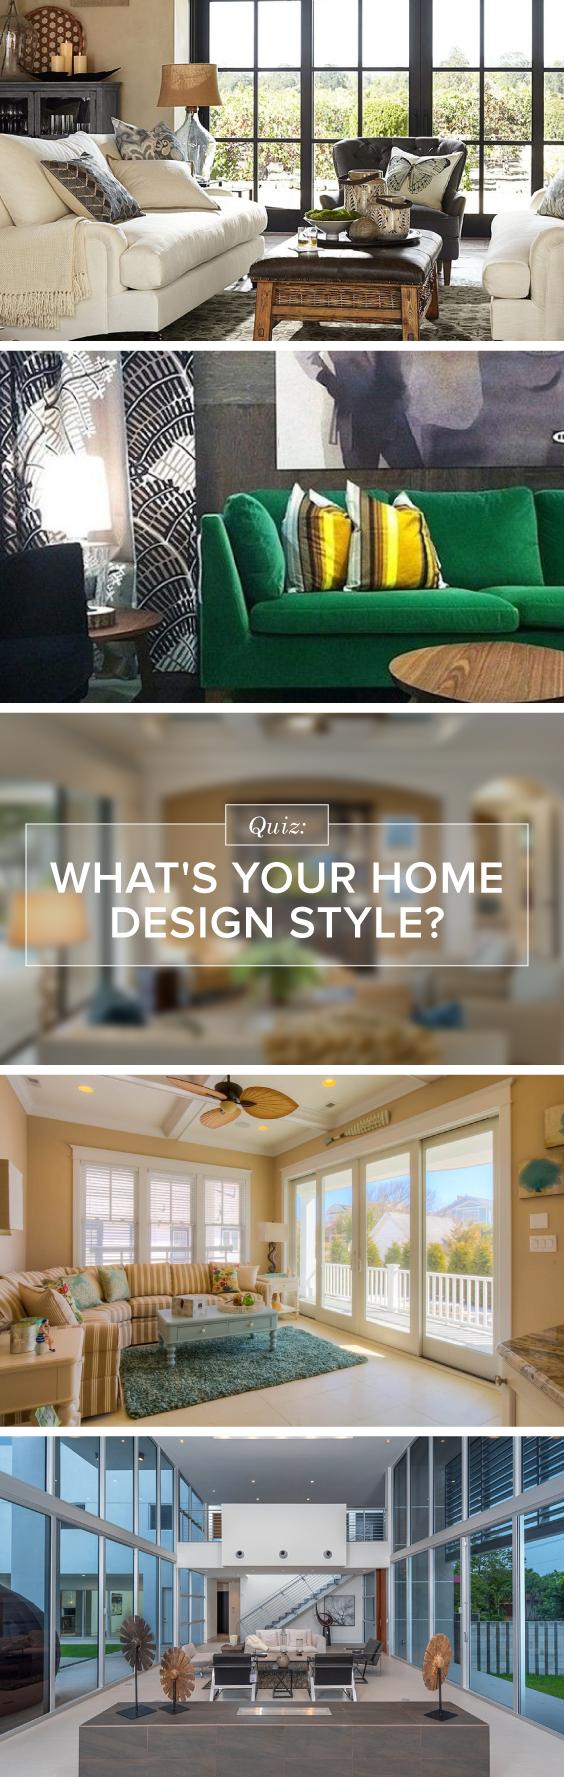 Home Design Quiz Part - 37: Pinterest